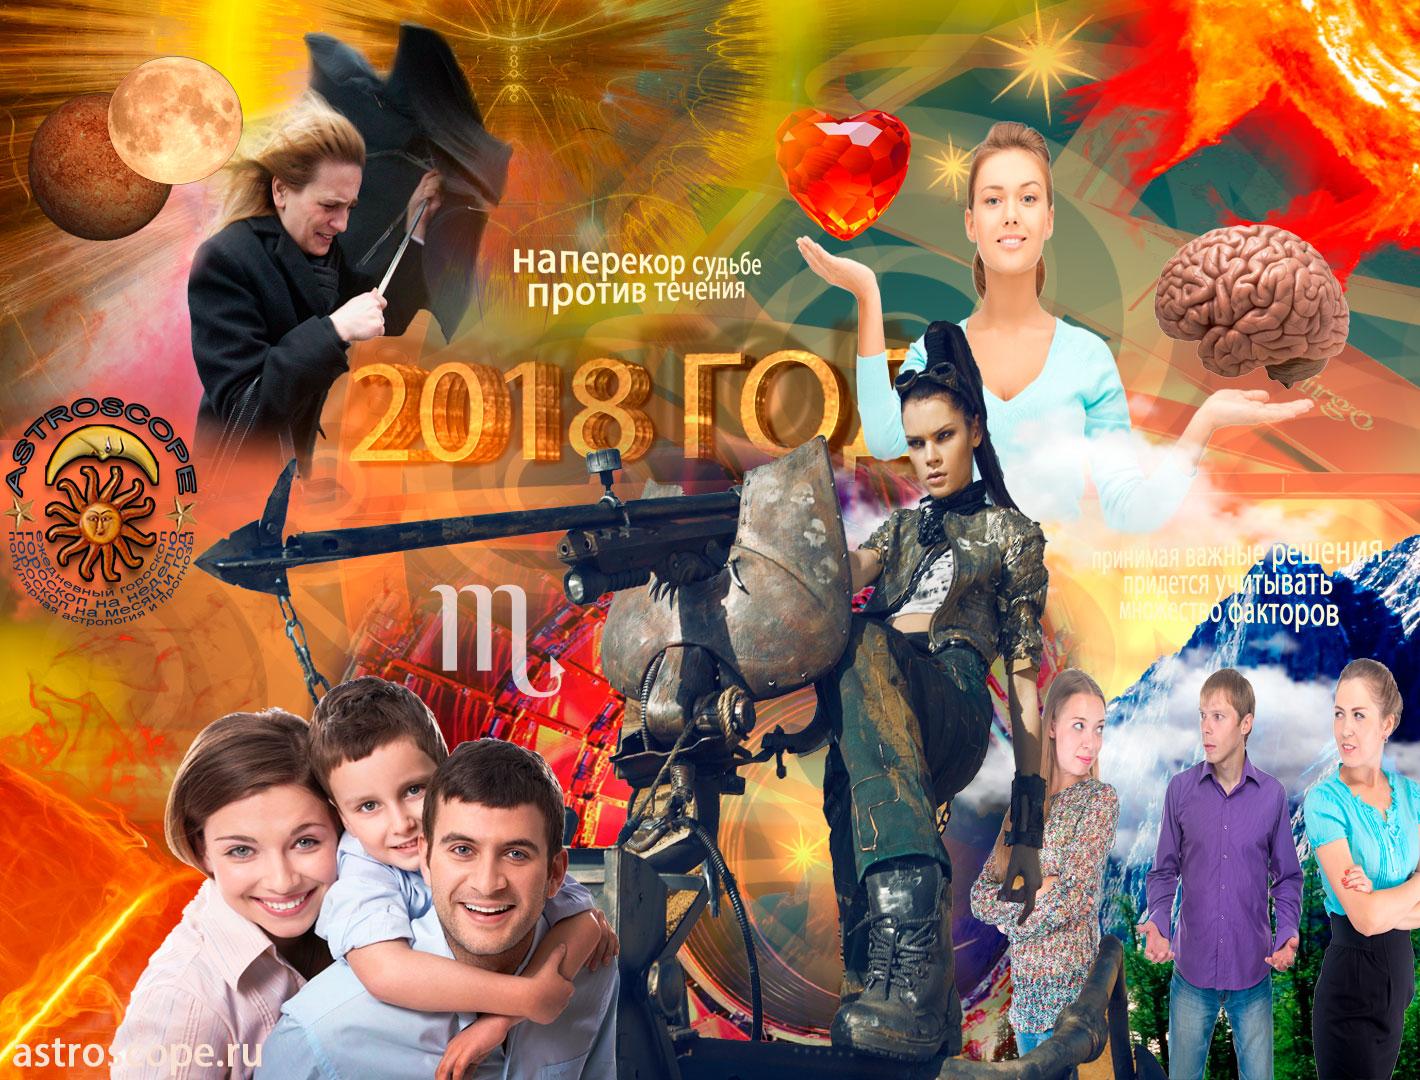 Гороскоп на 2020 год Скорпион, астрологический прогноз на 2020 год для Скорпионов